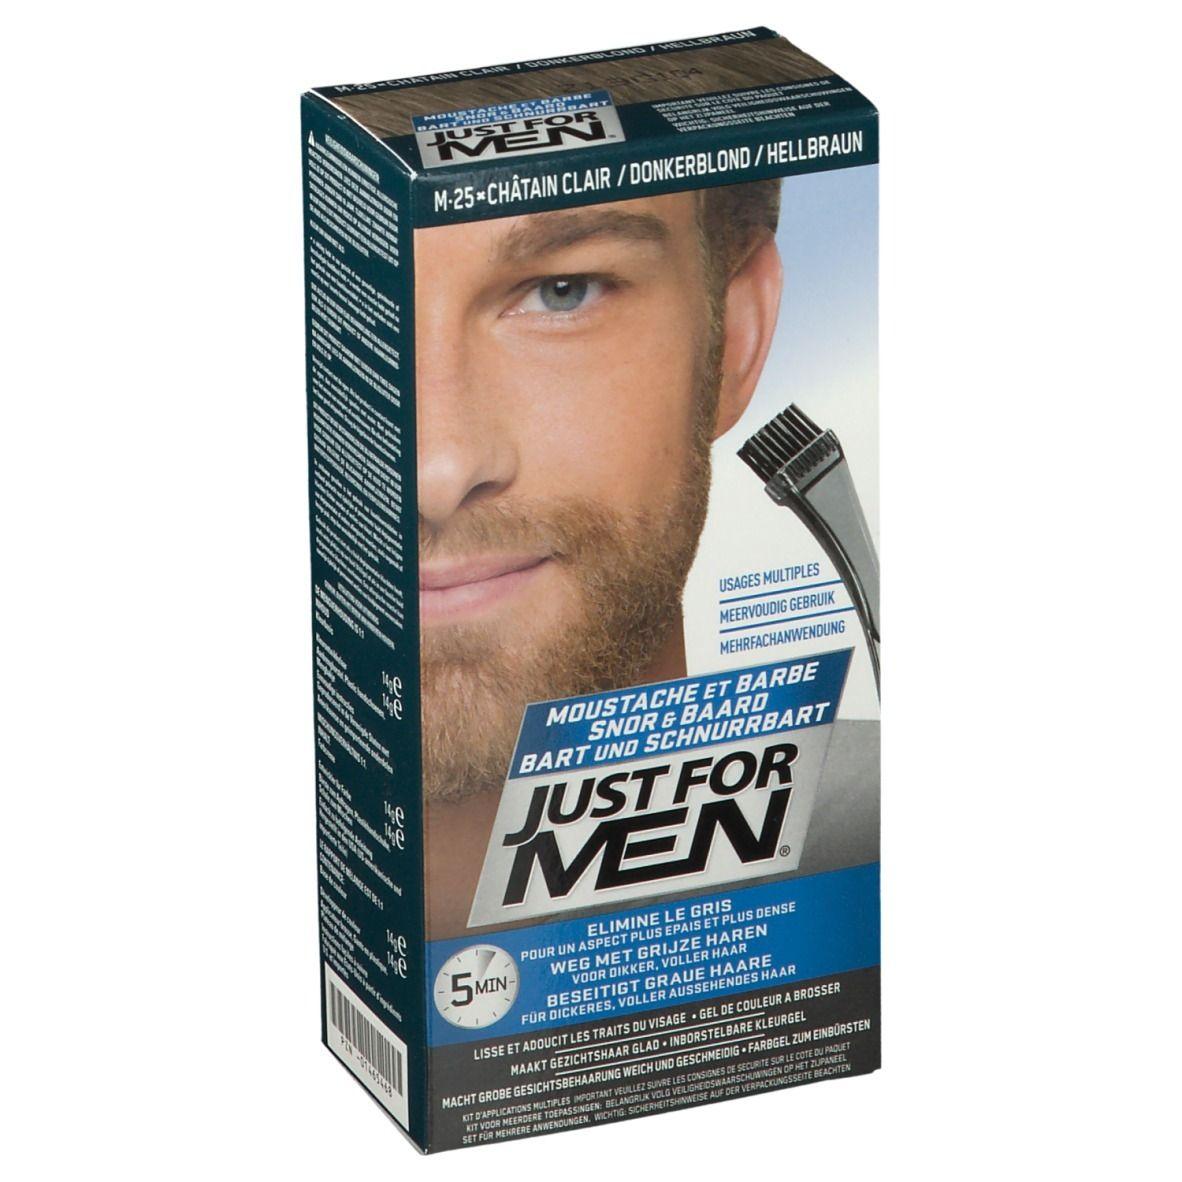 JUST FOR MEN Pflege-Brush-In-Color-Gel hellbraun